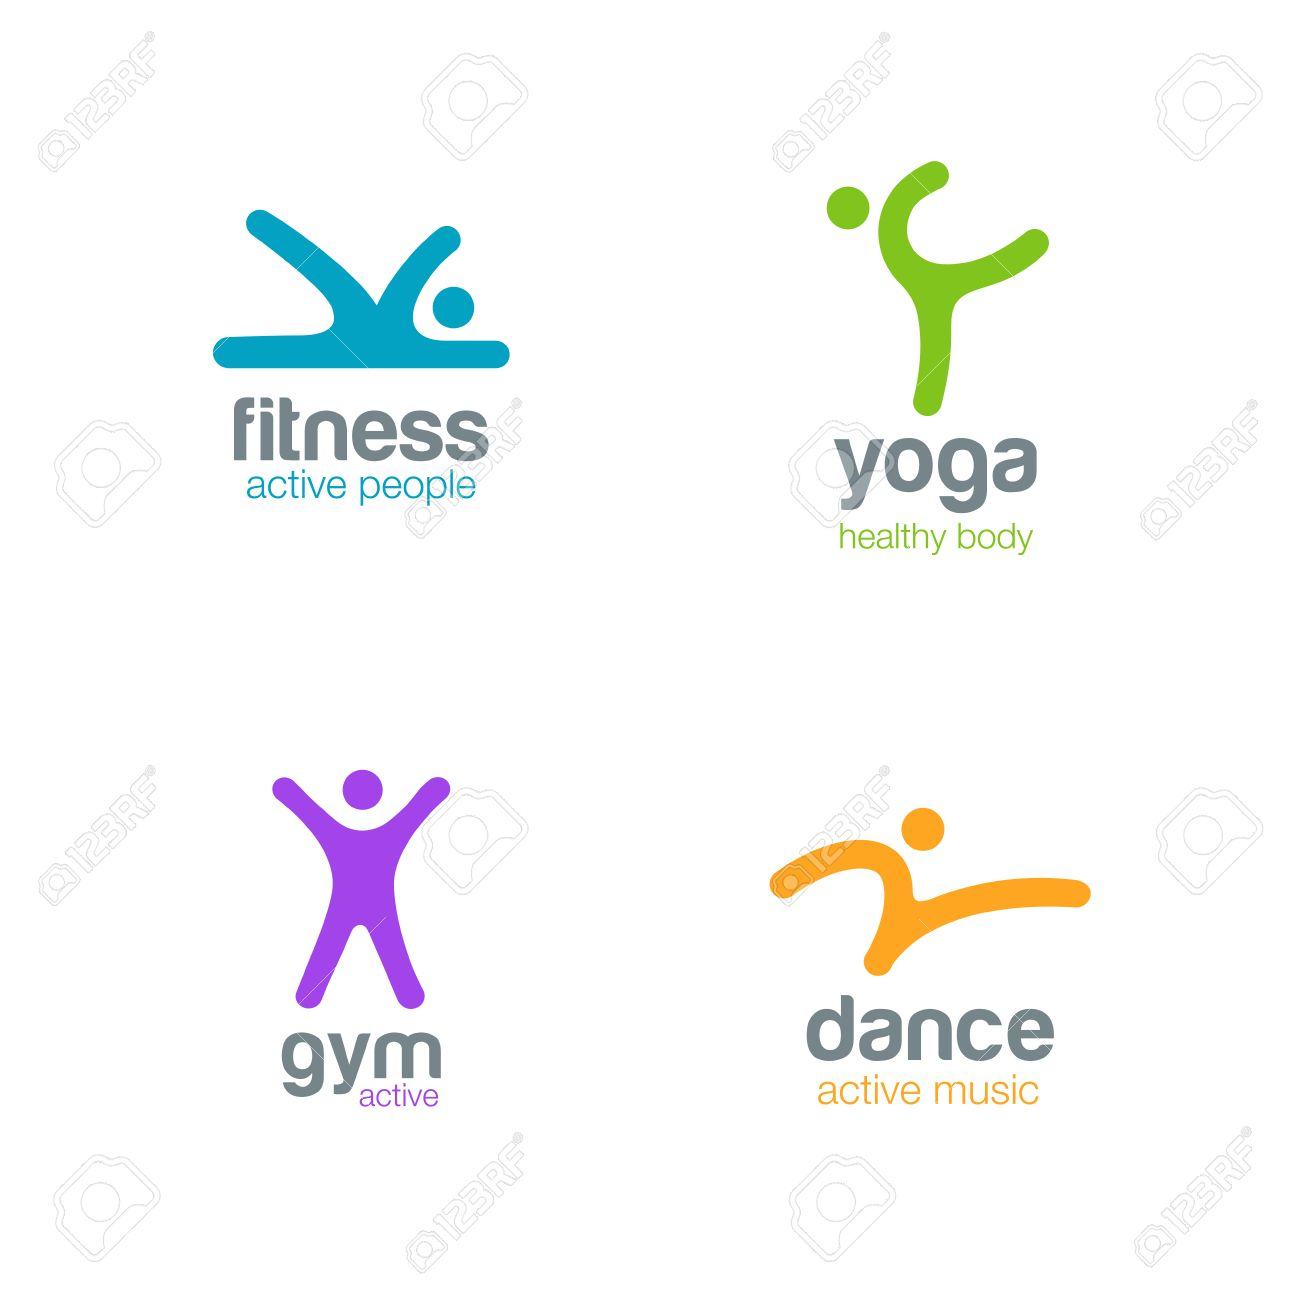 fitness dance yoga gym logos design vector templates active